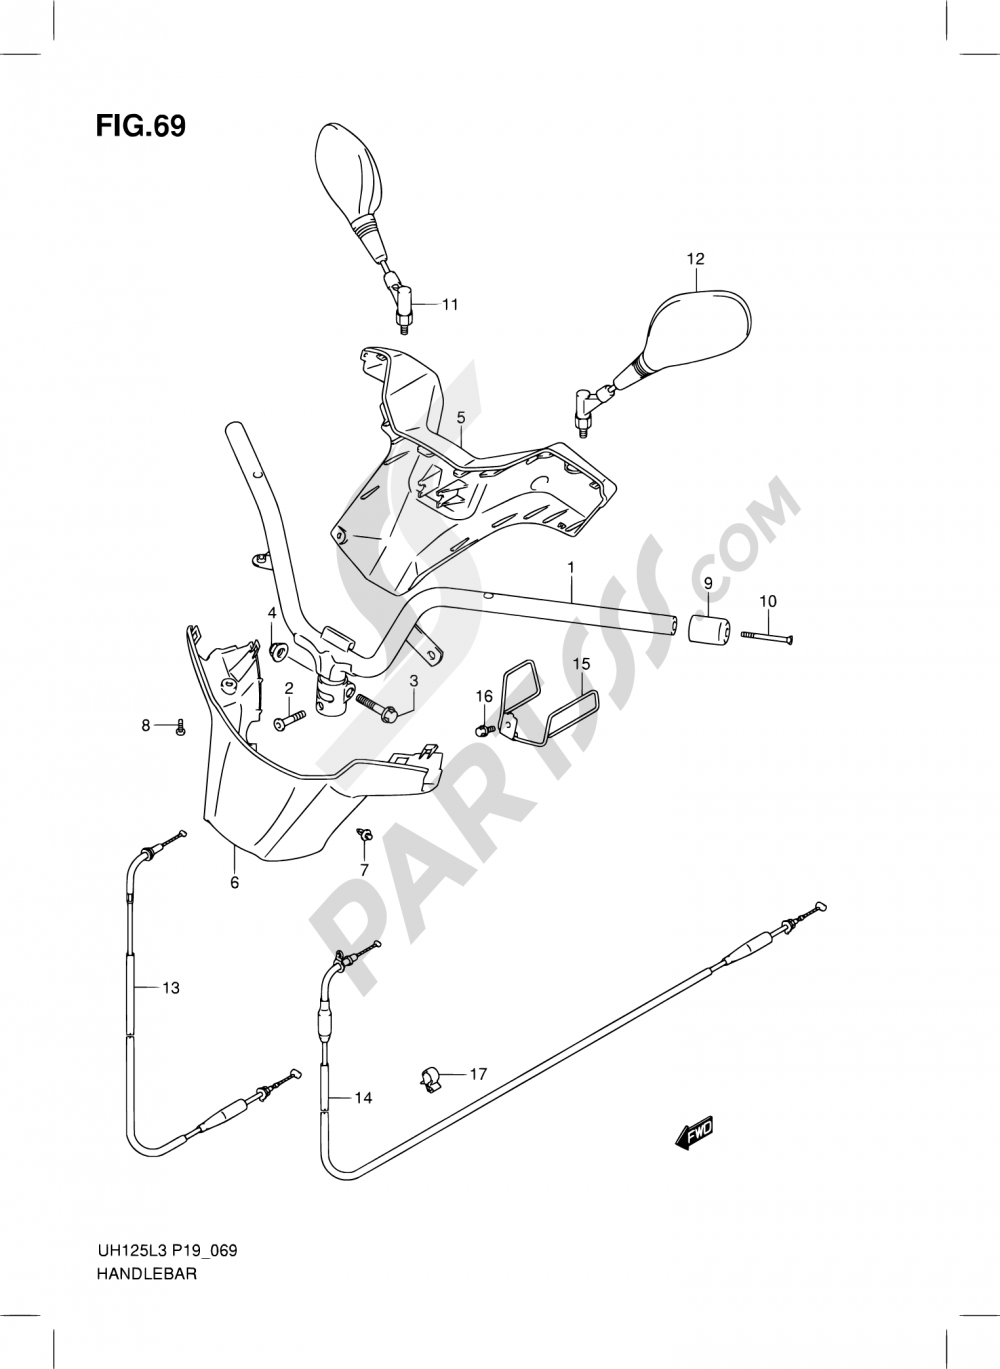 69 - HANDLEBAR (UH125GL3 P19) Suzuki BURGMAN UH125G 2013